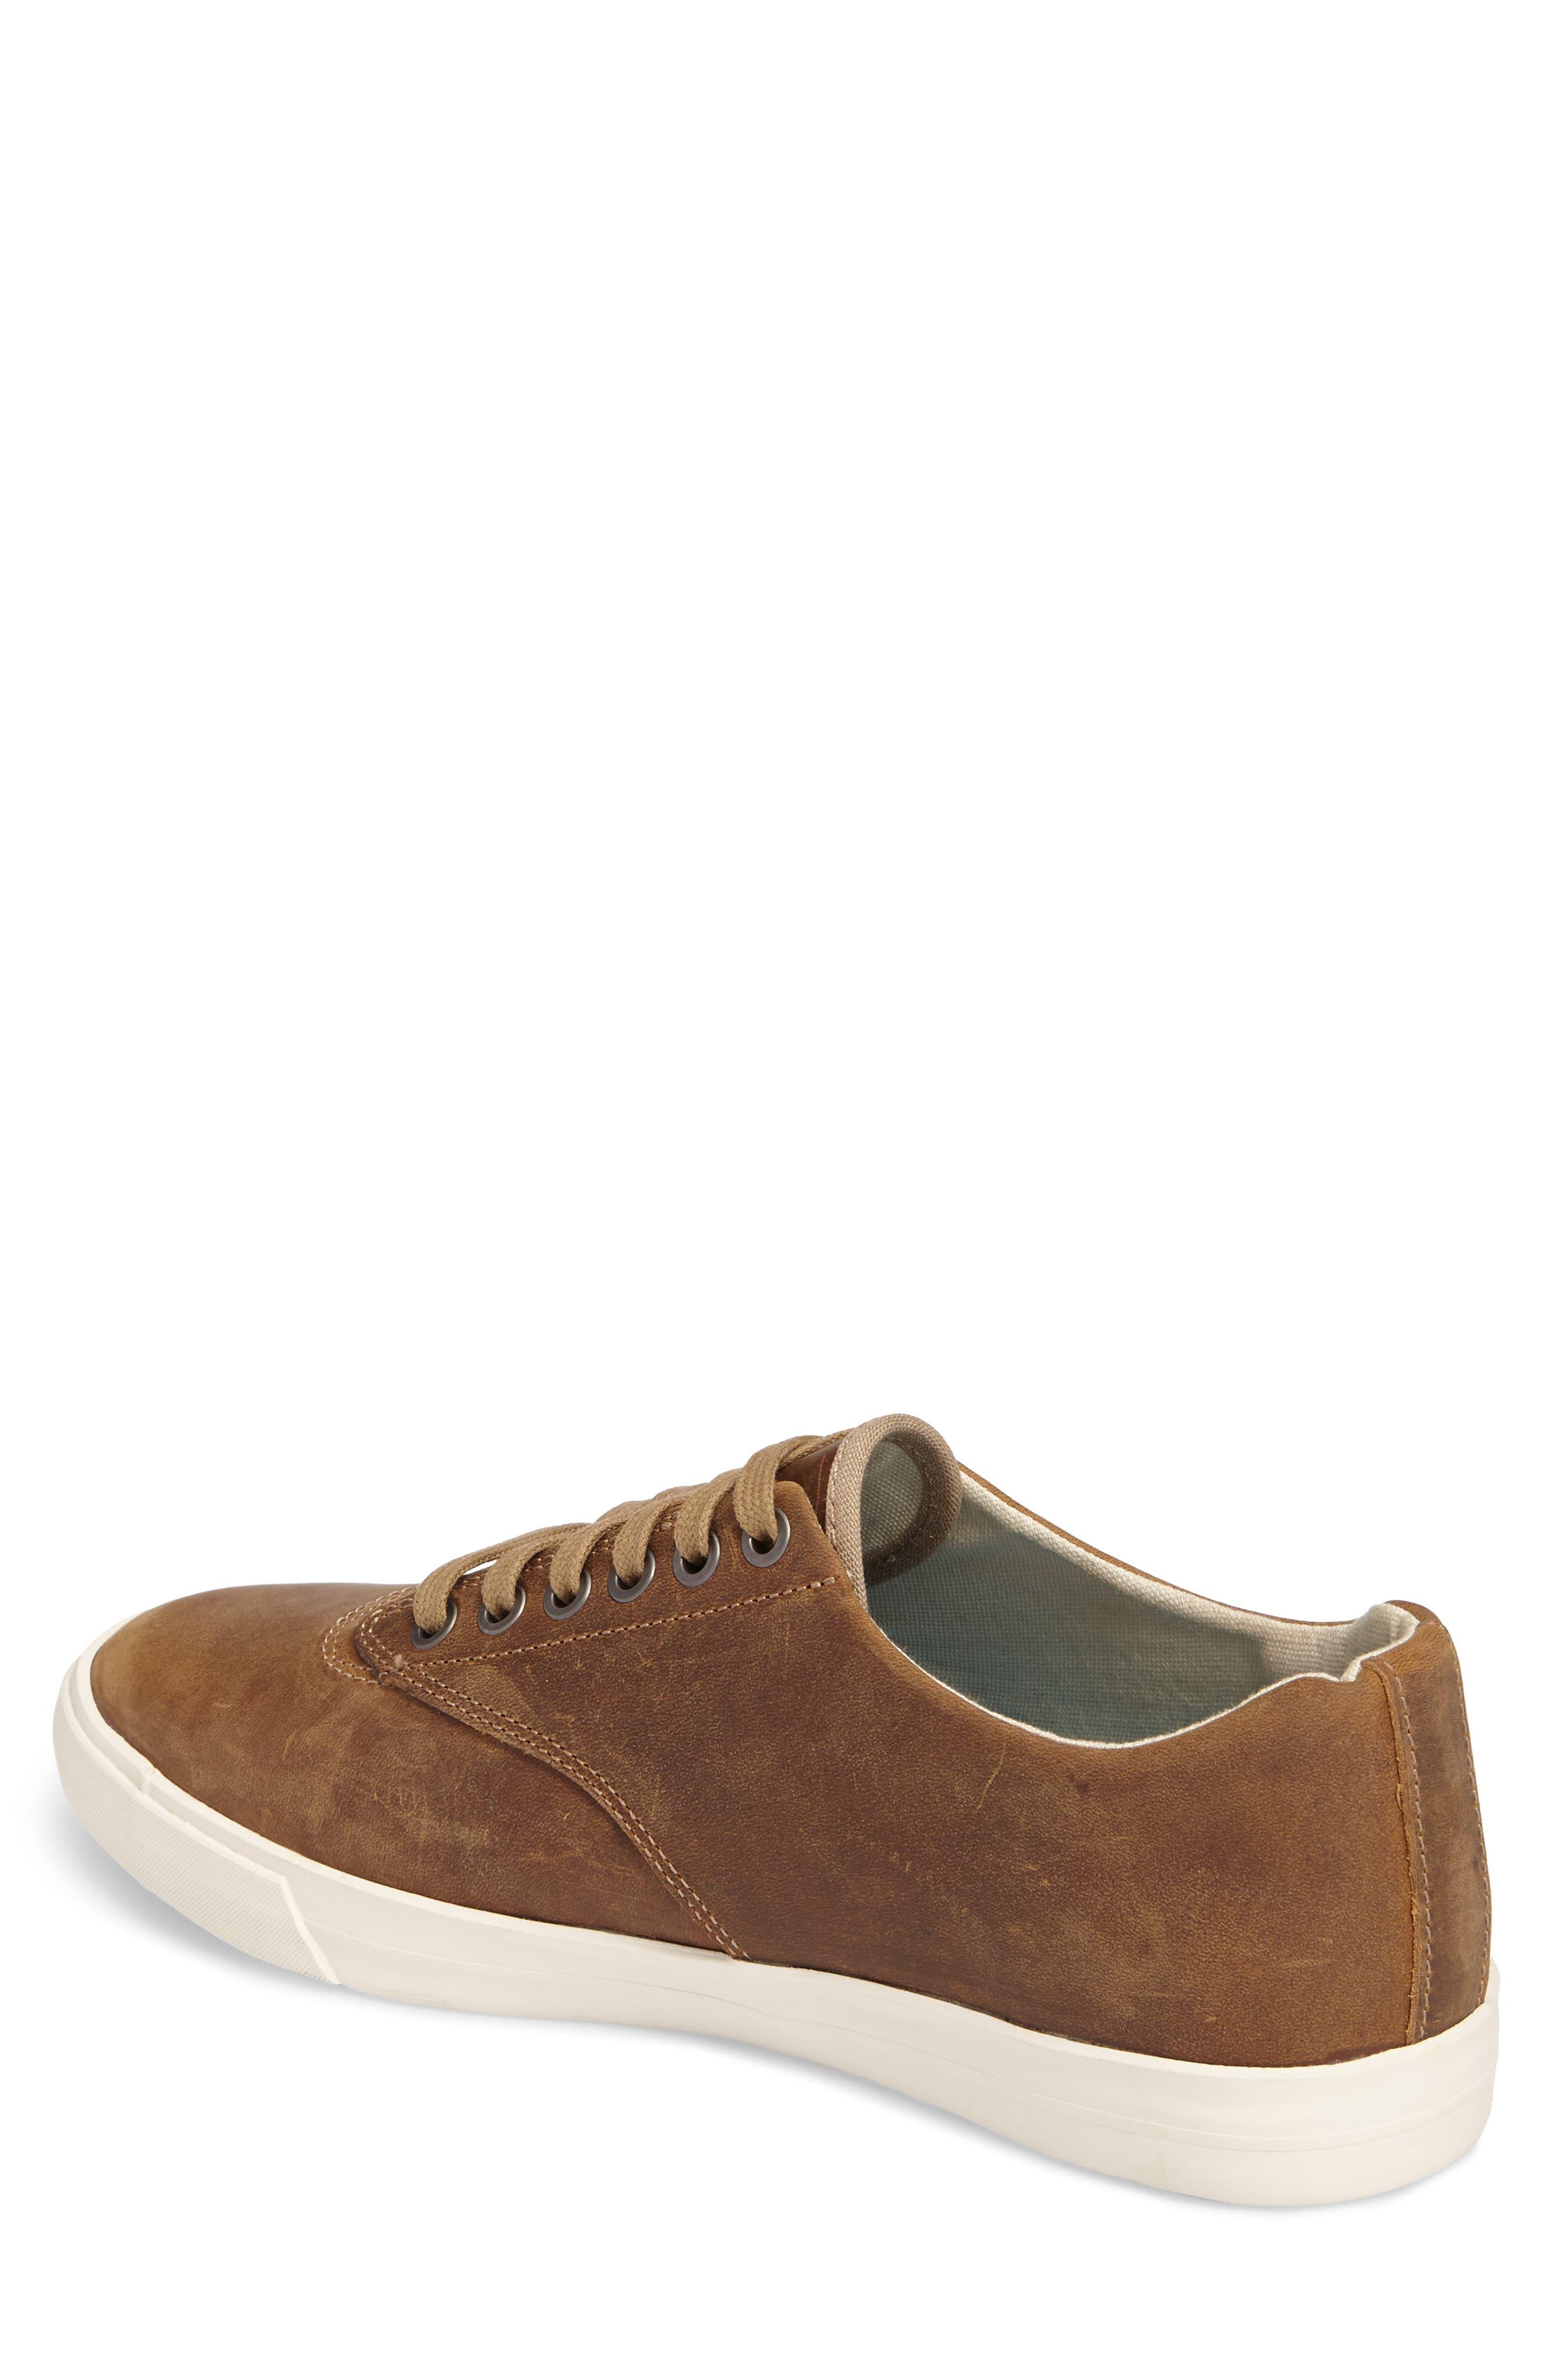 Hermosa Plimsoll Wintertide Sneaker,                             Alternate thumbnail 2, color,                             Elmwood Leather